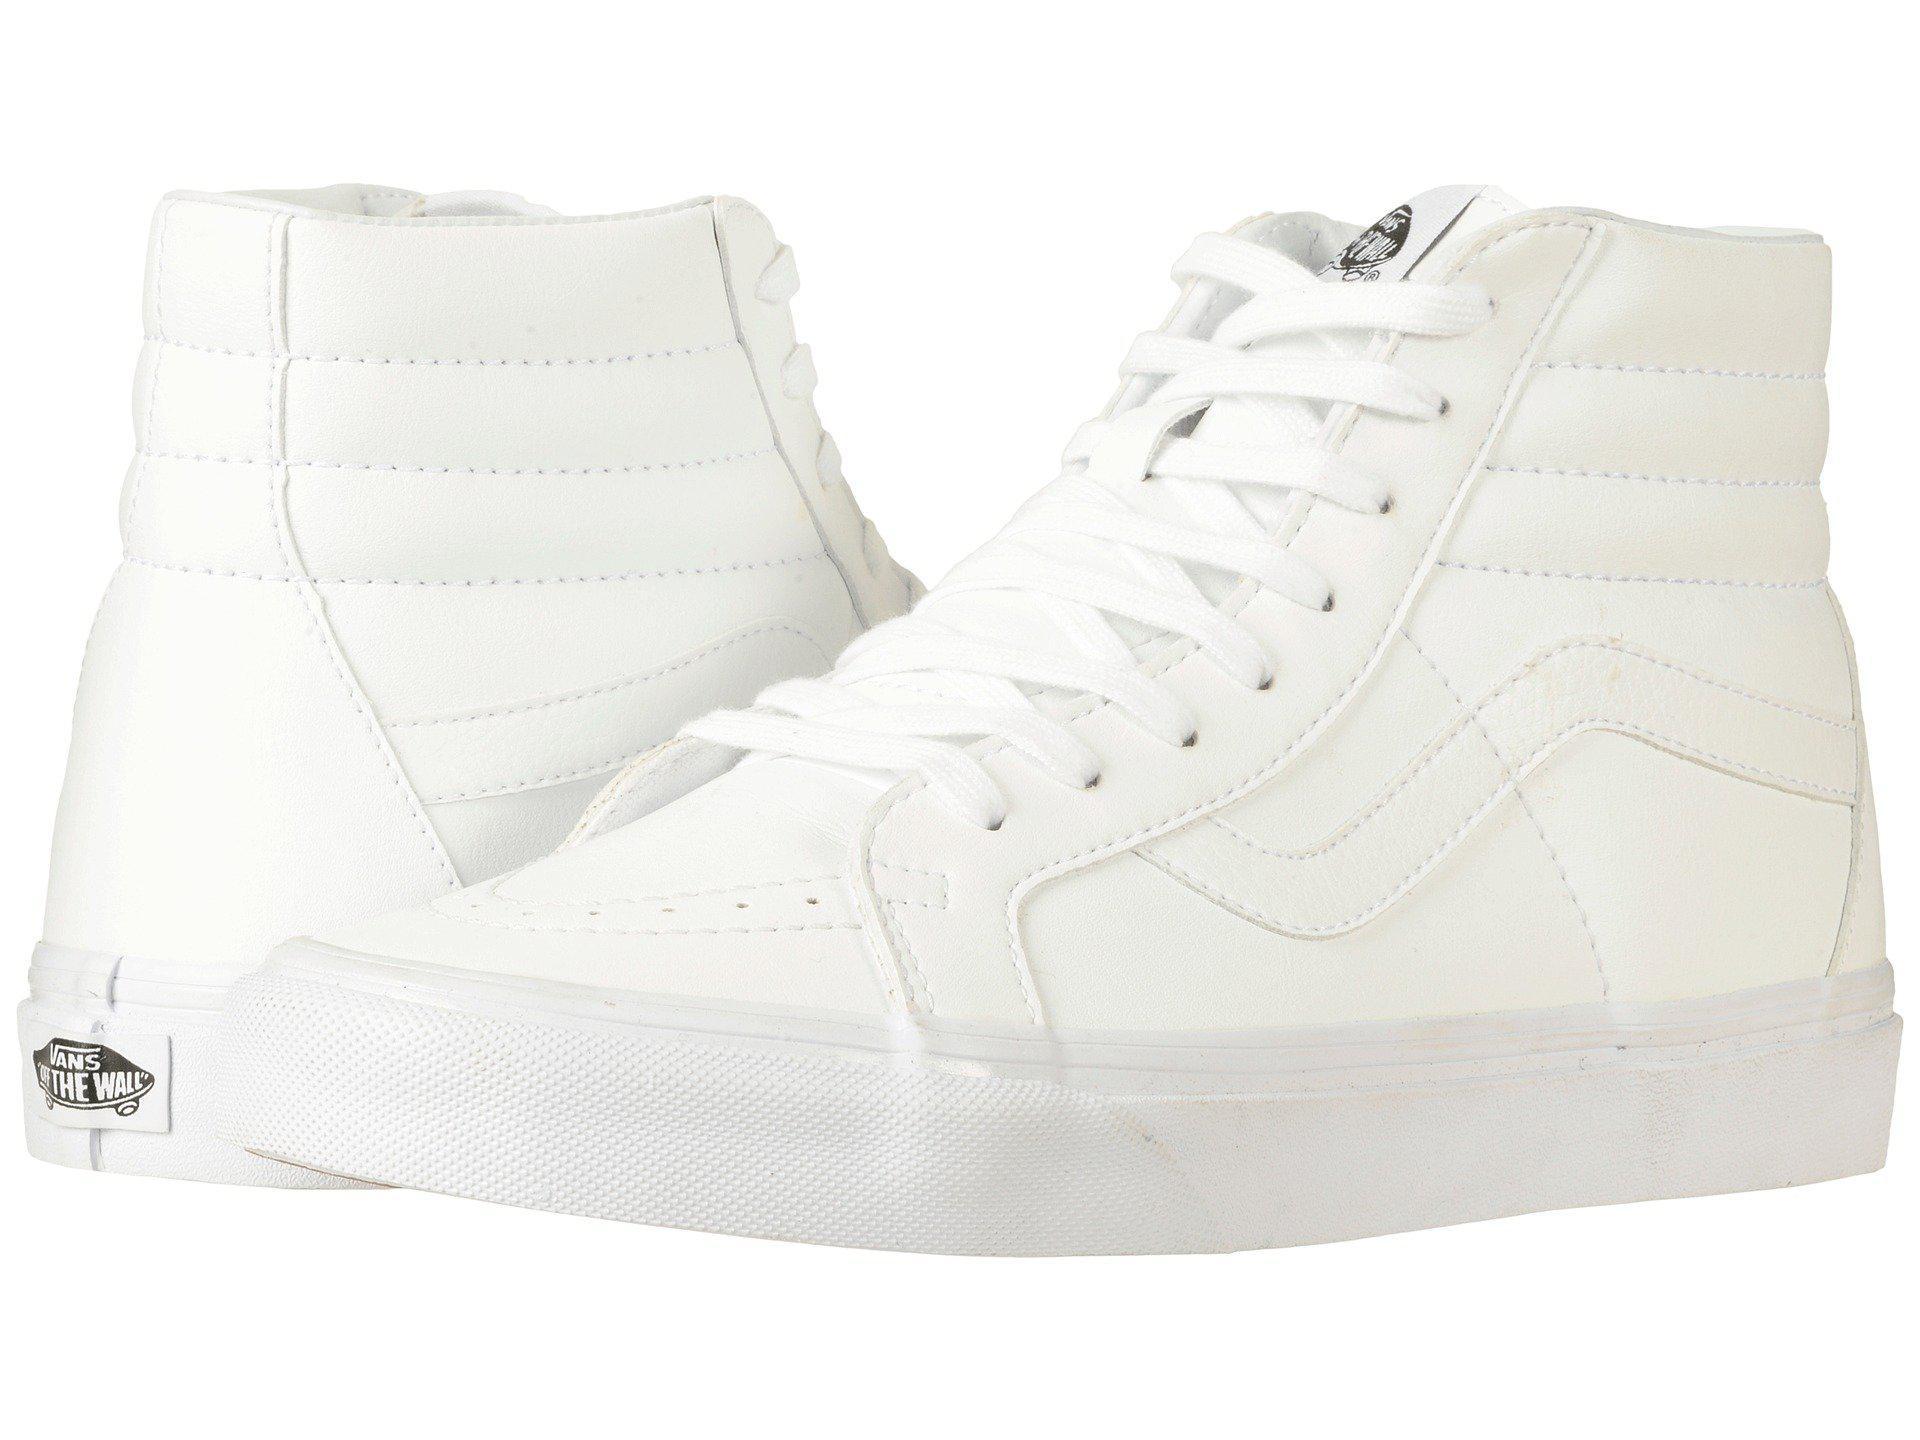 97bef0f17b21 Lyst - Vans Sk8-hi Reissue ((leather fleece) Black true White 2 ...